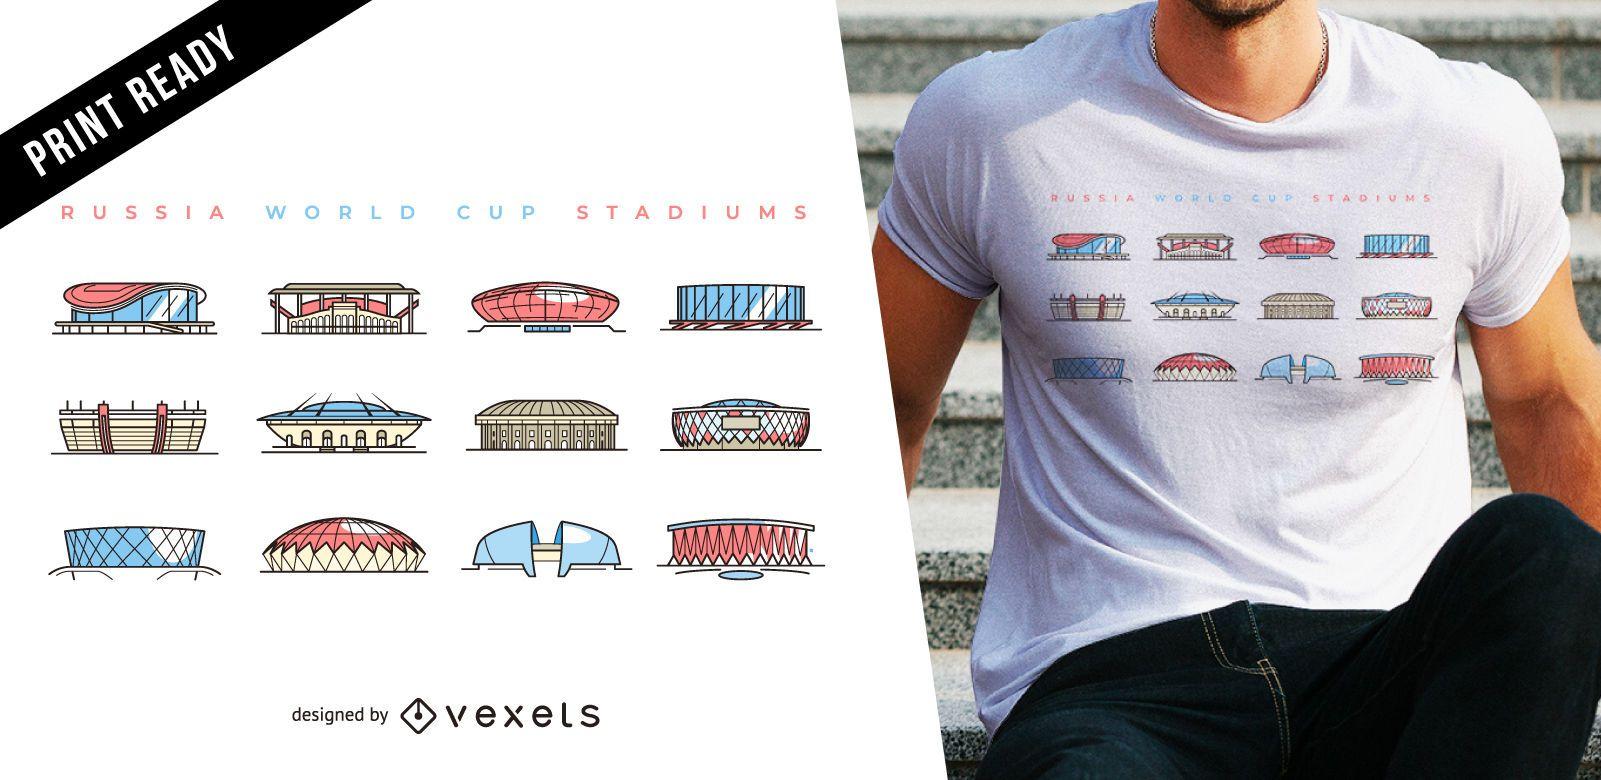 World cup stadiums t-shirt design